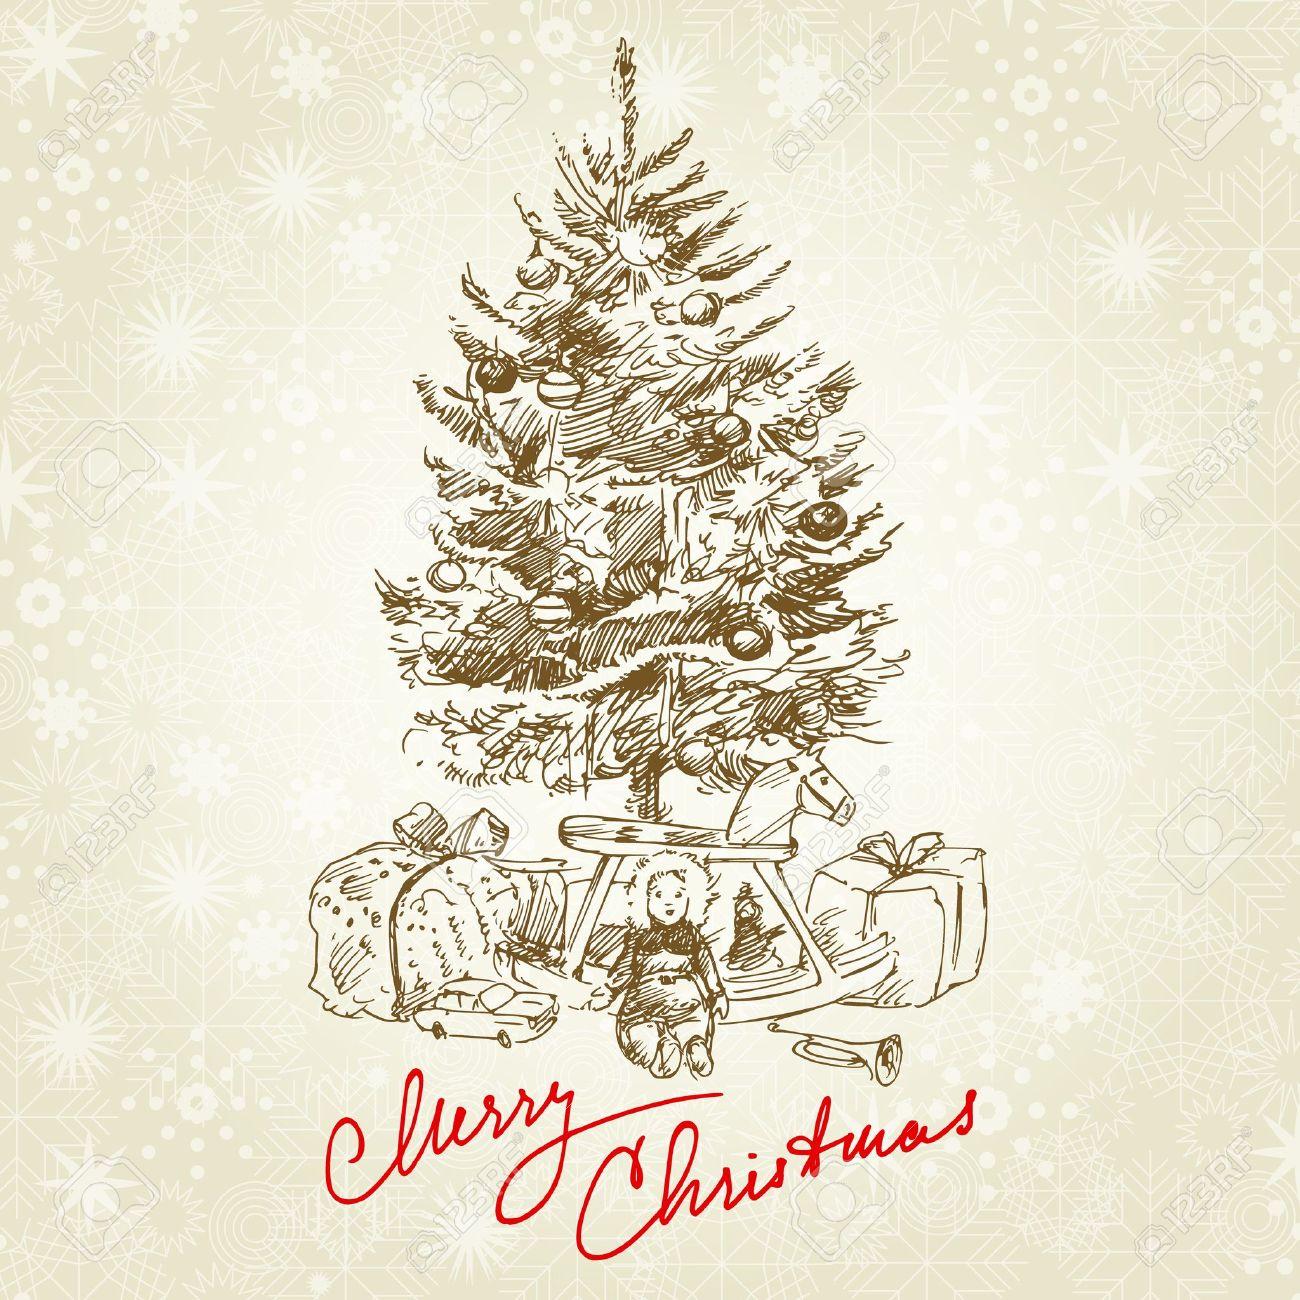 hand drawn vintage christmas tree stock vector 14968907 - Vintage Christmas Trees